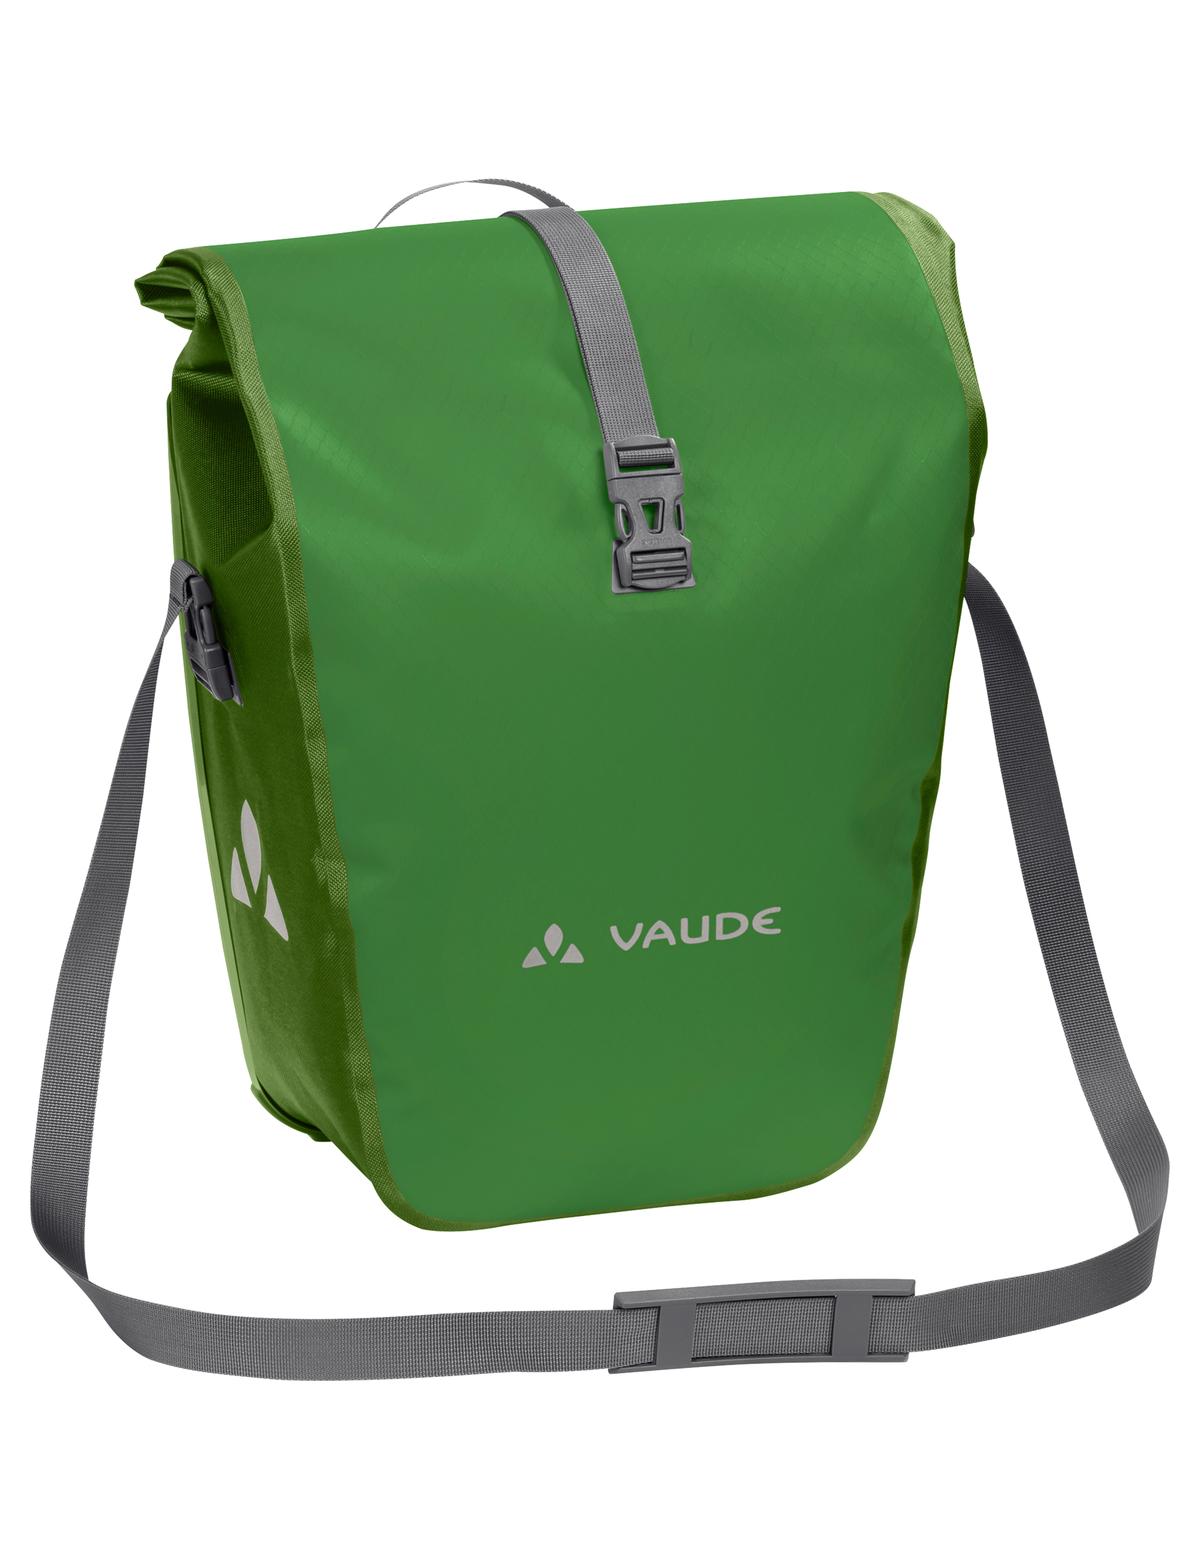 VAUDE Aqua Back Single parrot green  - 2-Rad-Sport Wehrle